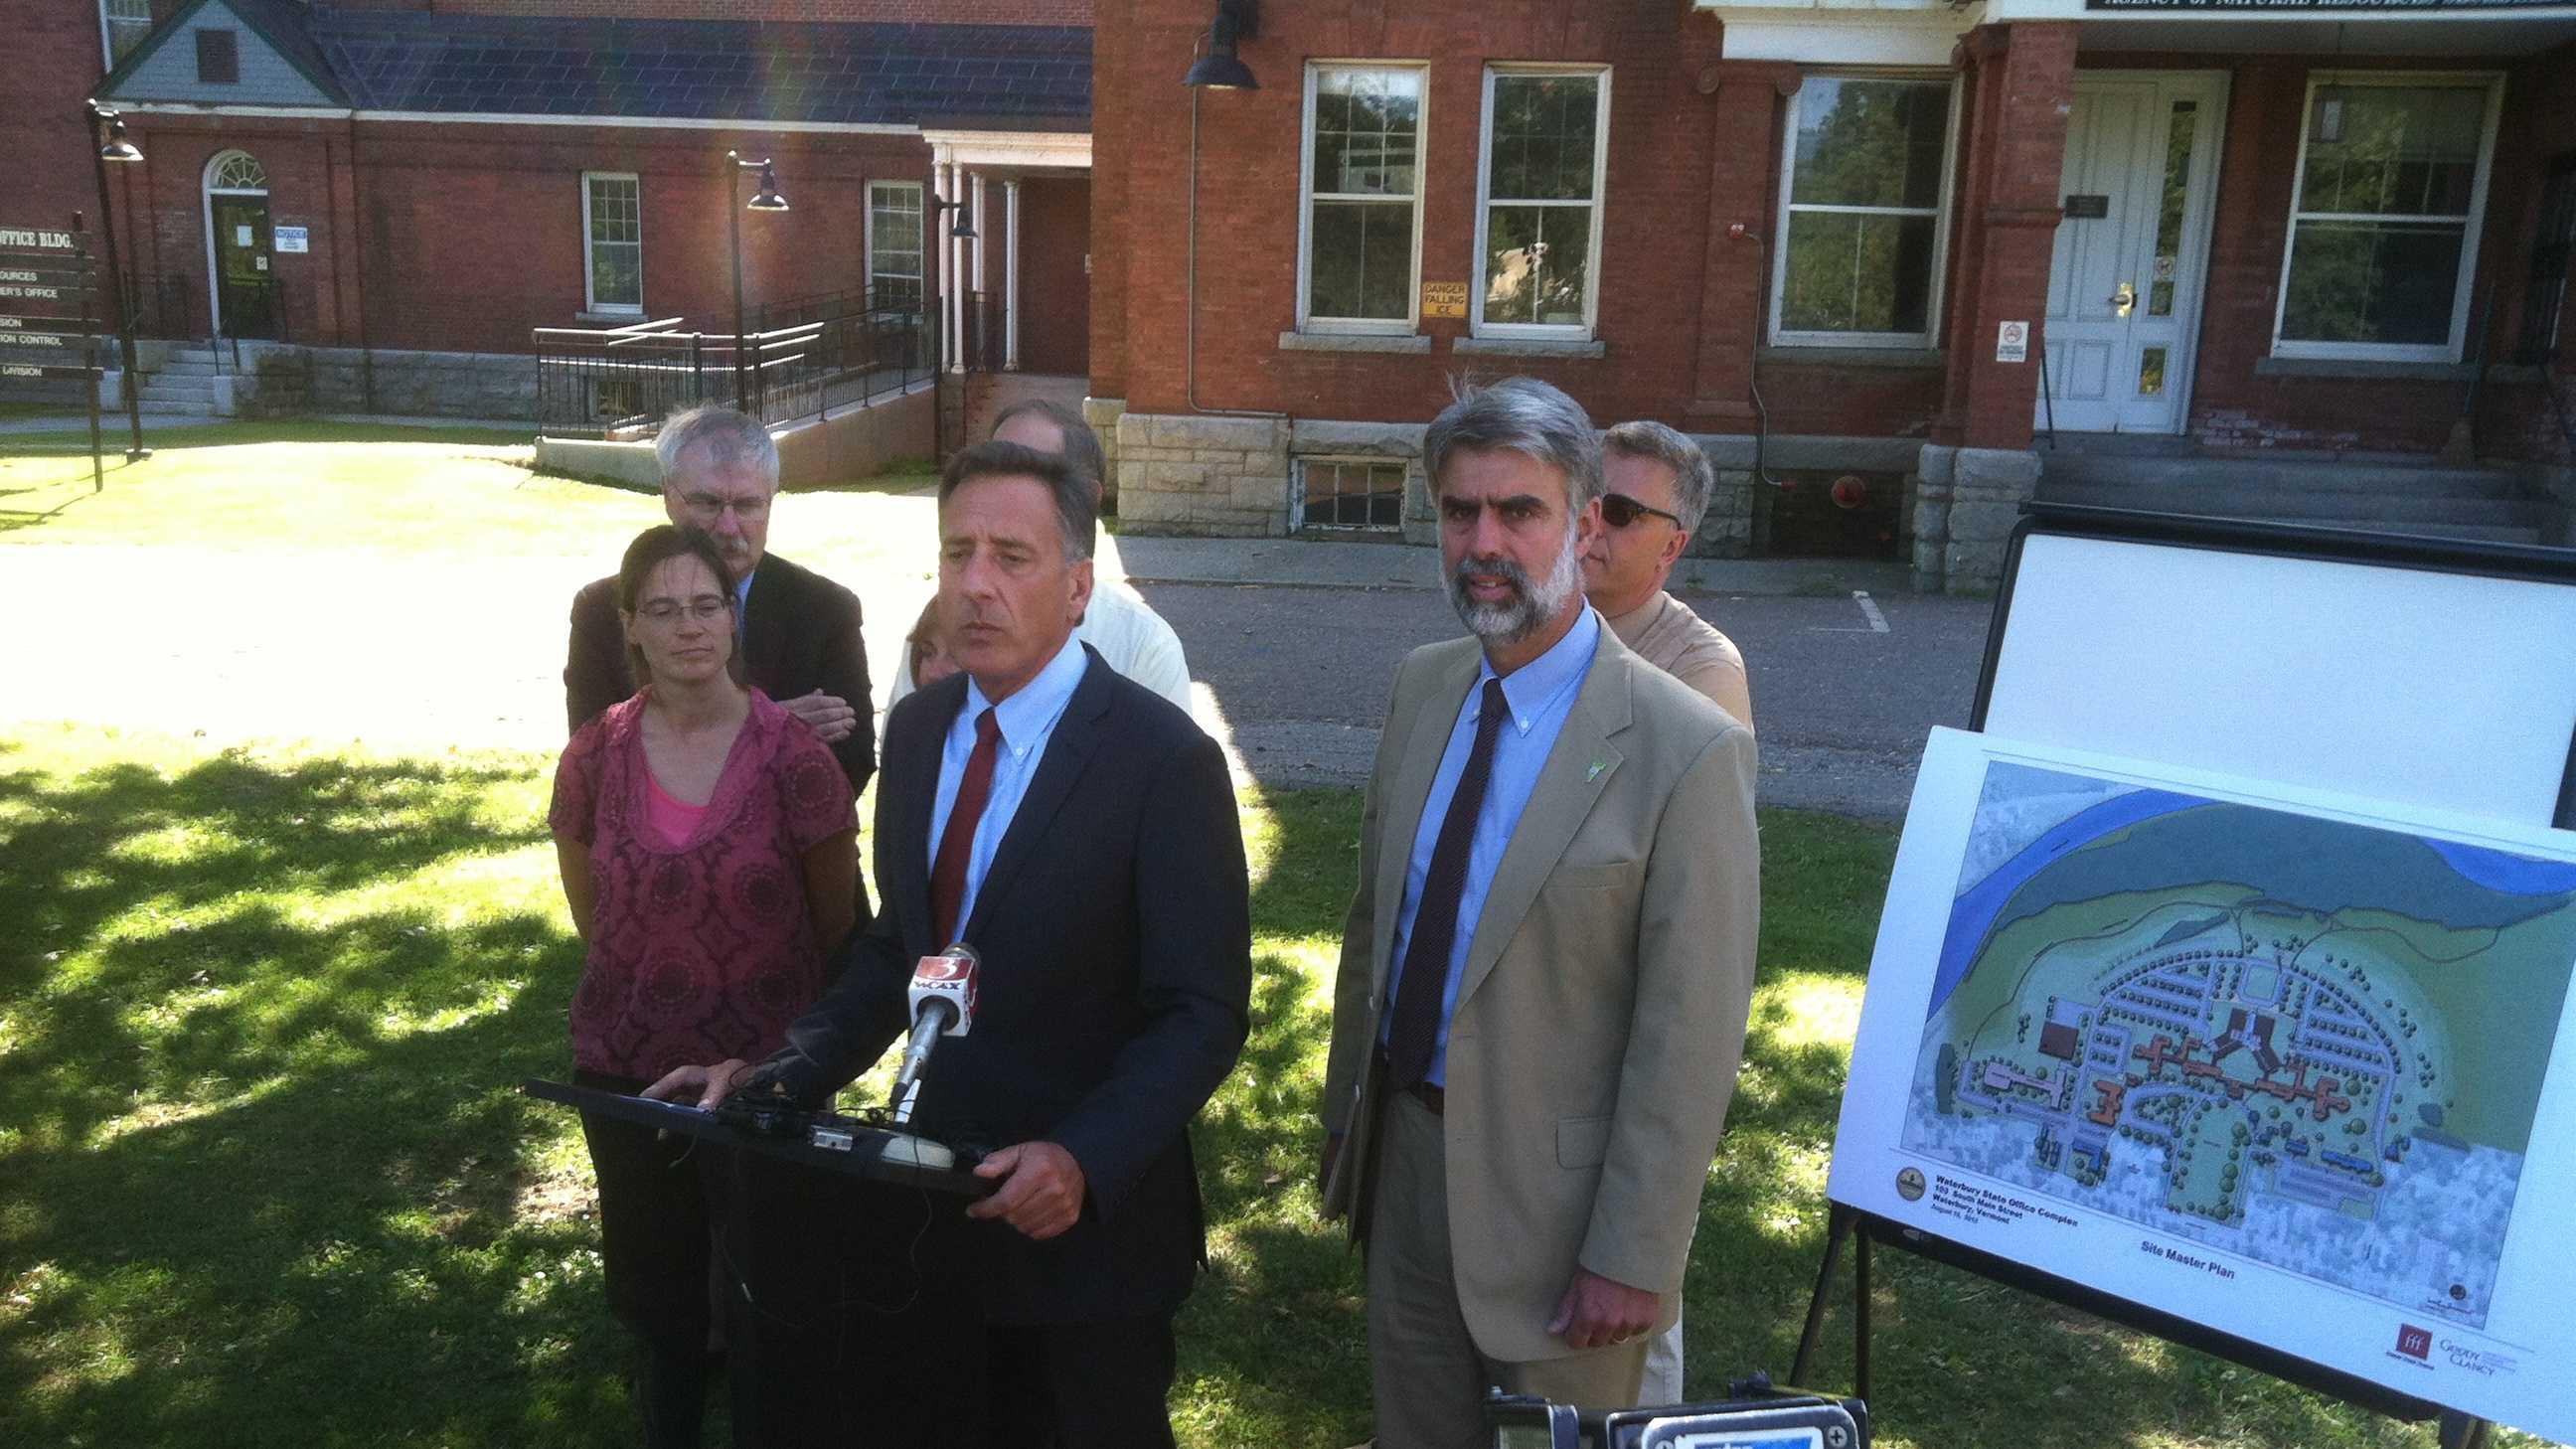 091212 Vt. governor: FEMA funding will remain uncertain - img